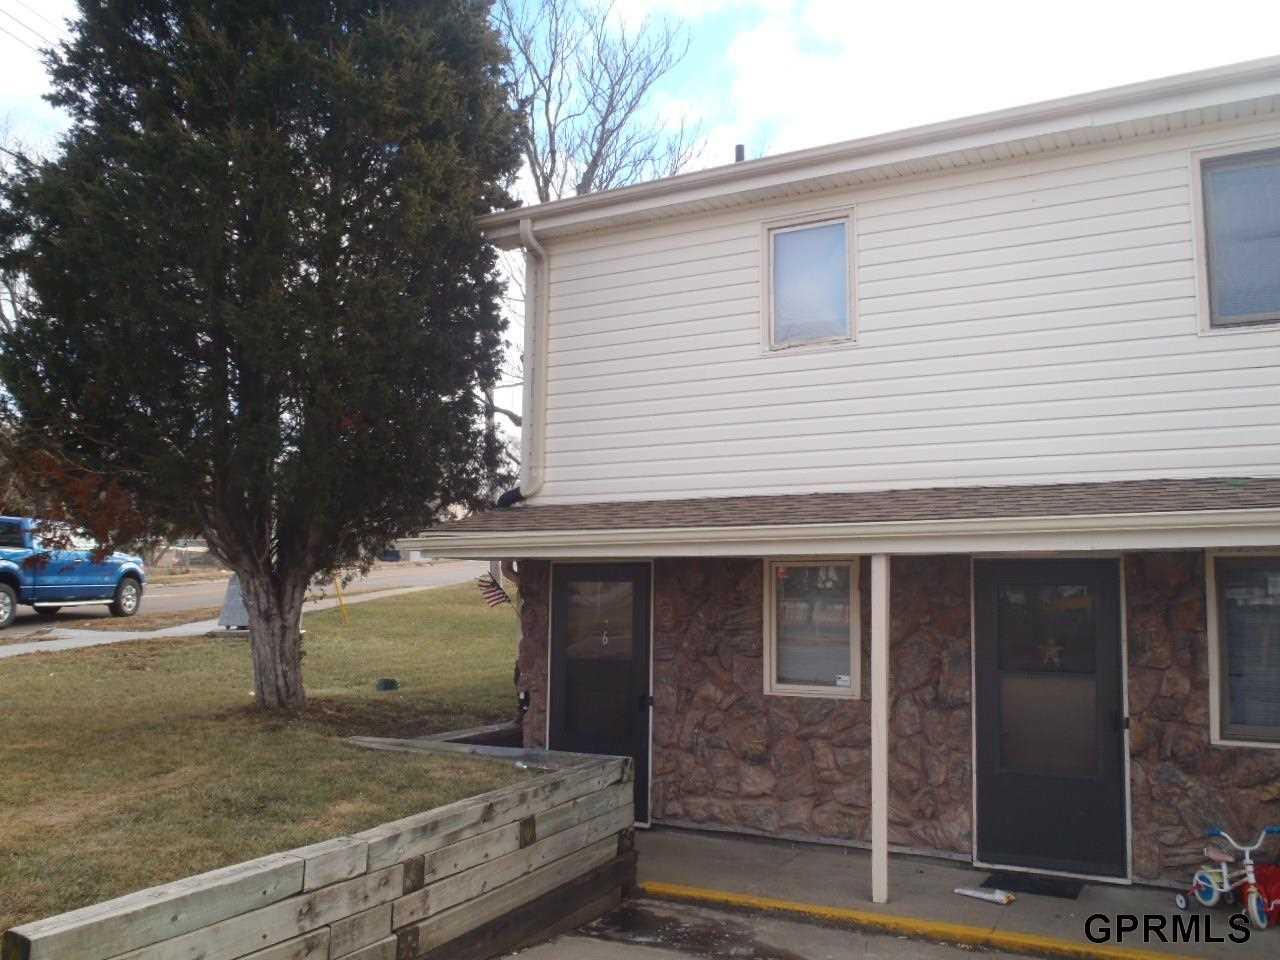 Rental Homes for Rent, ListingId:31004125, location: 302 1/2 Galvin Rd N Bellevue 68005